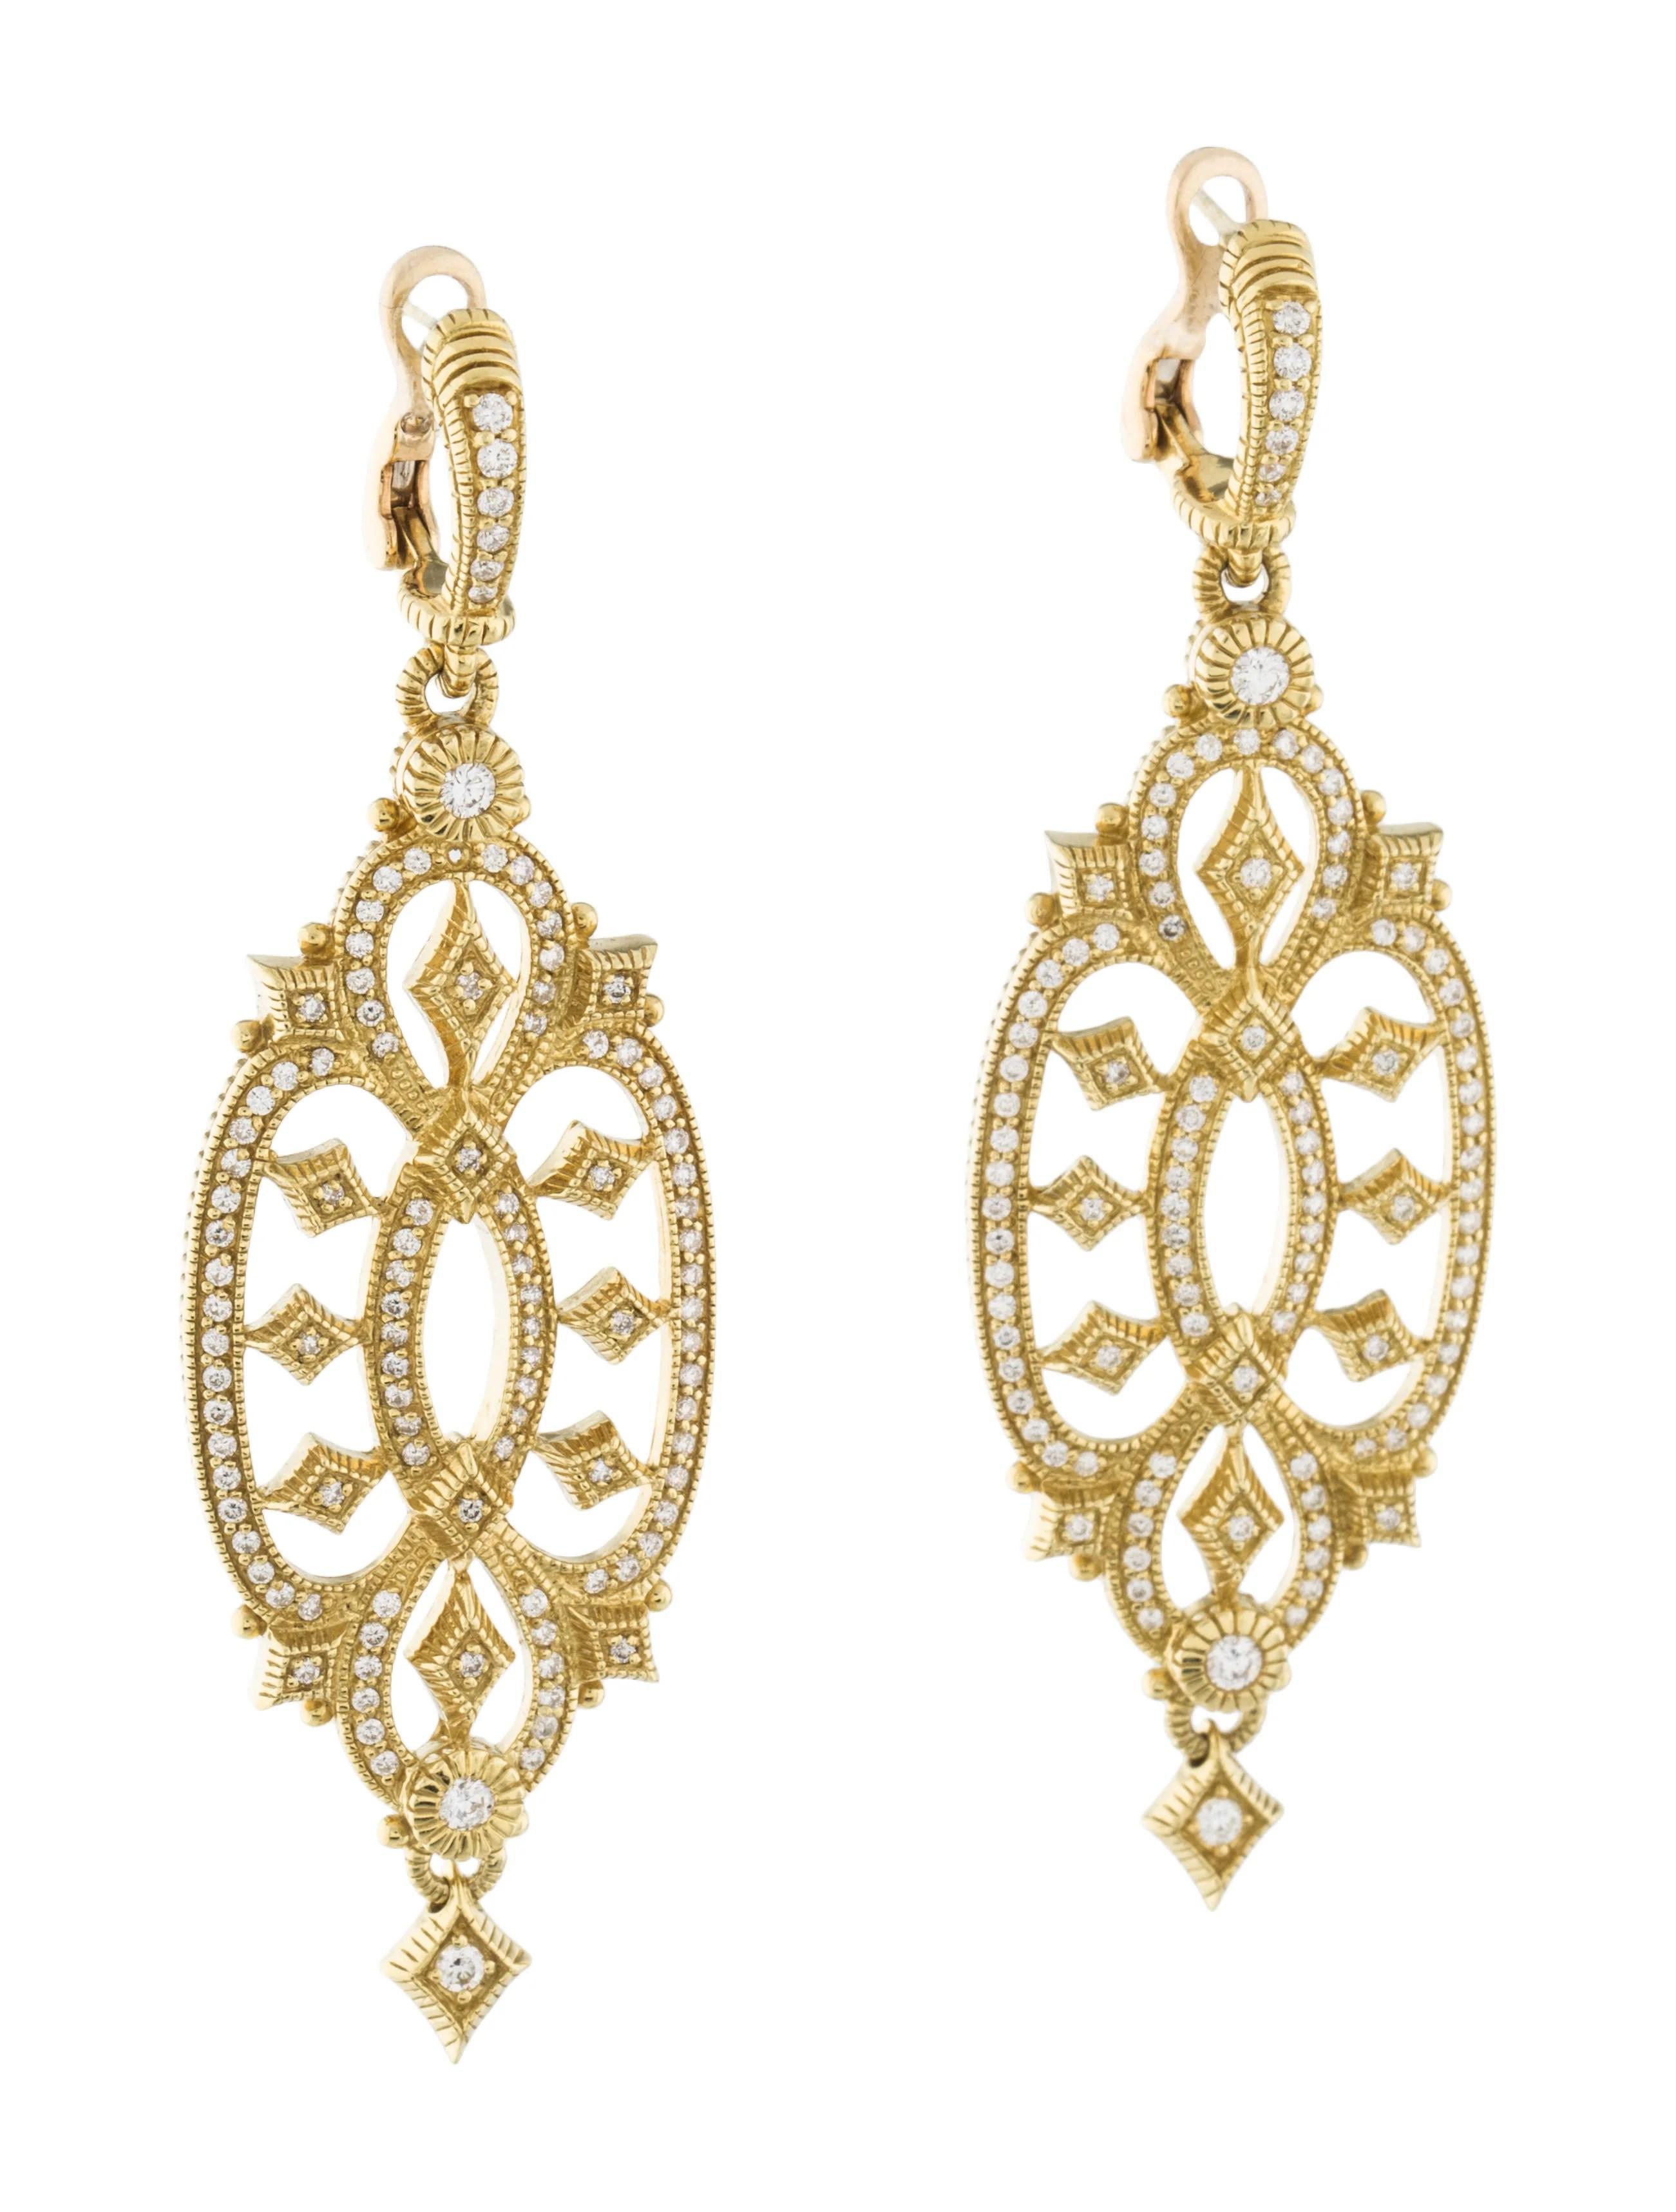 Judith Ripka 18k Diamond Earrings  Earrings  Jrk23670